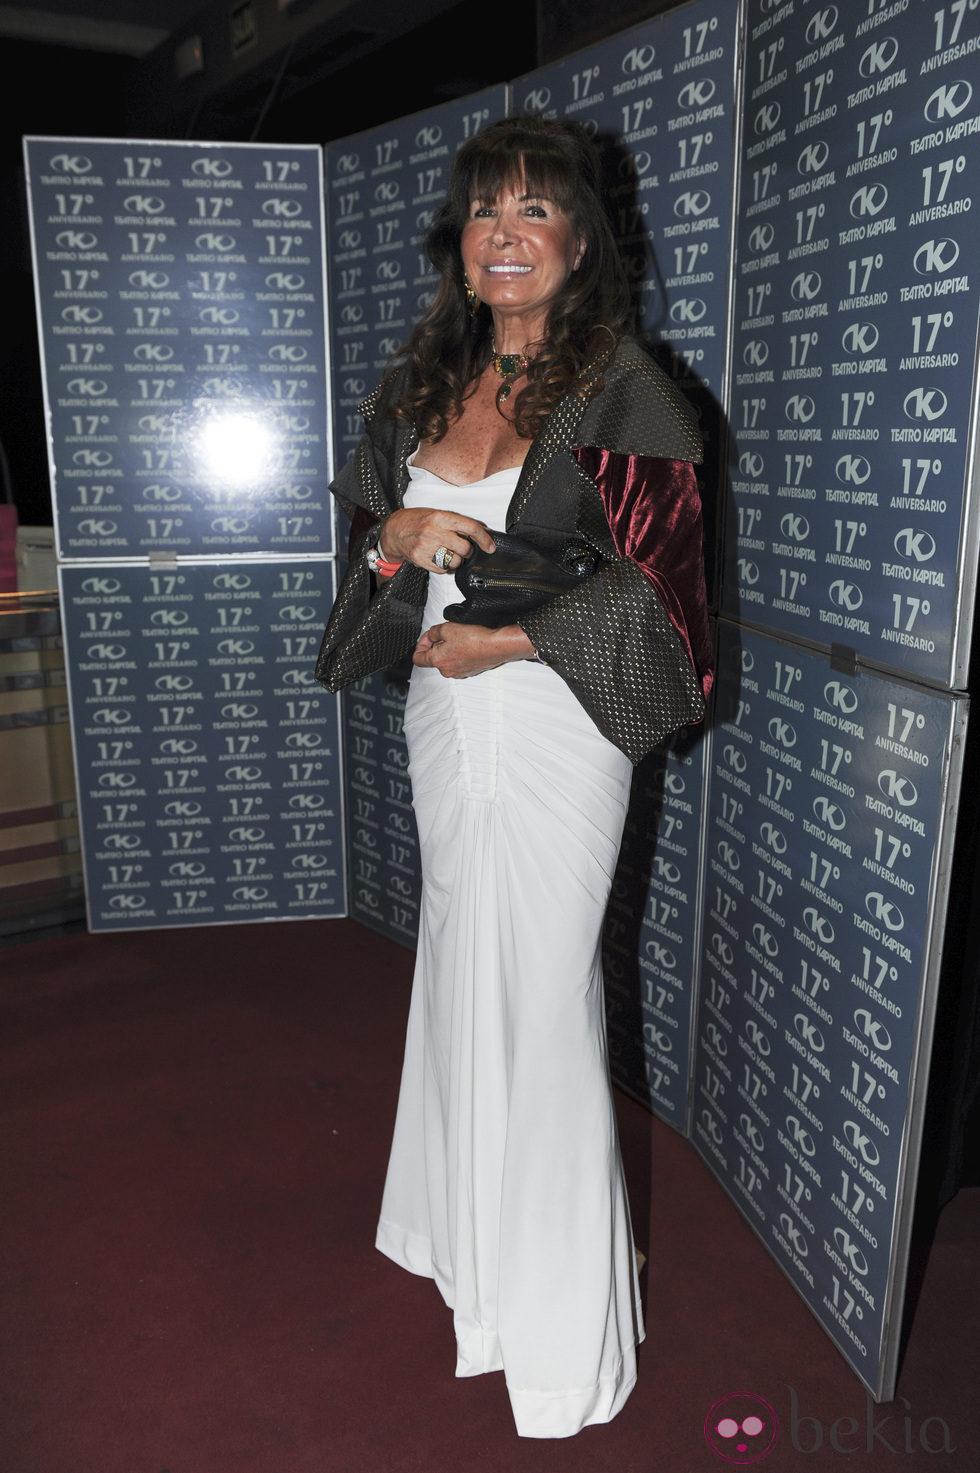 Helena Aznar en la fiesta del 17 aniversario de la discoteca Kapital